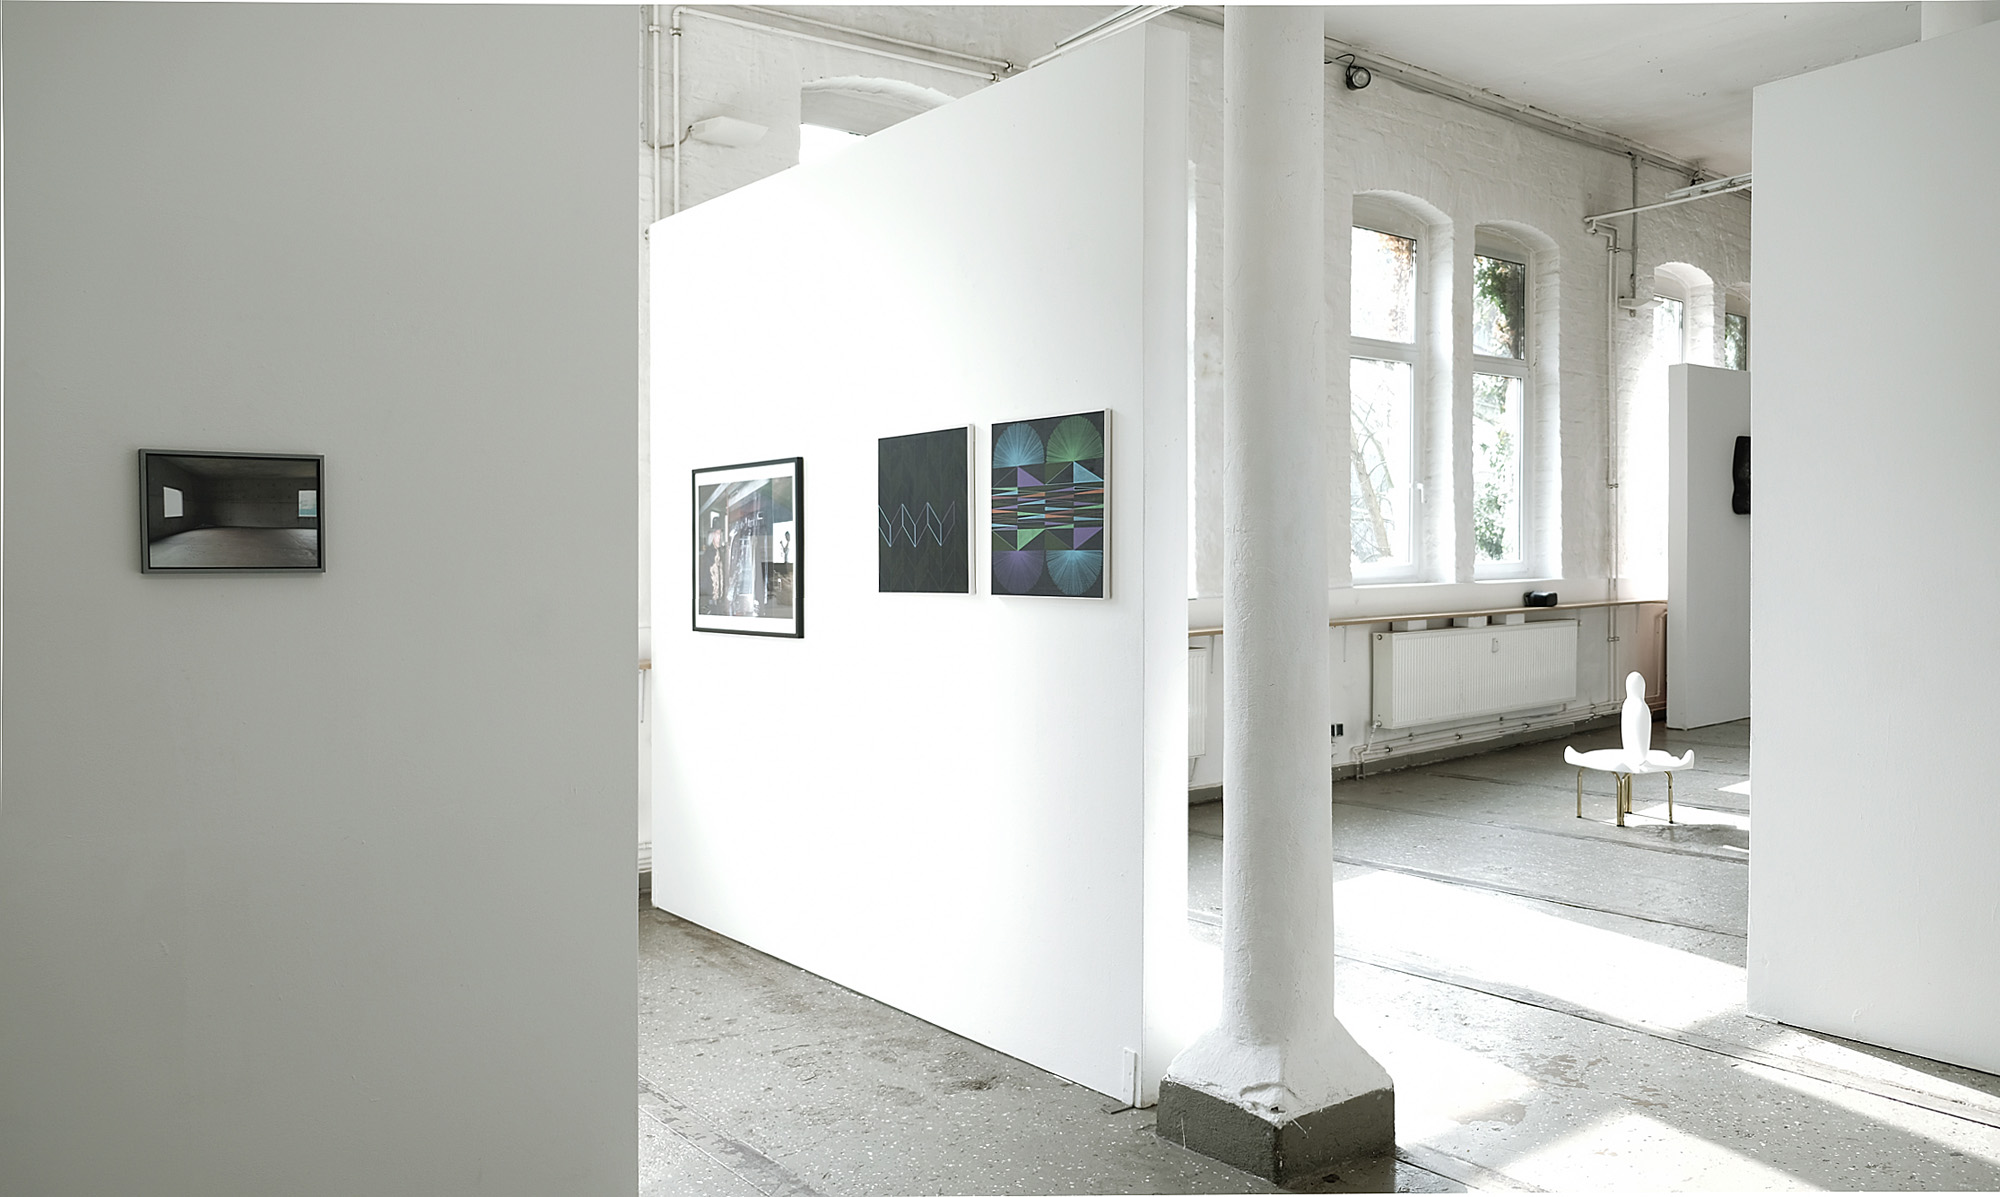 Jonas Hohnke | Julia Zinnbauer | DAG